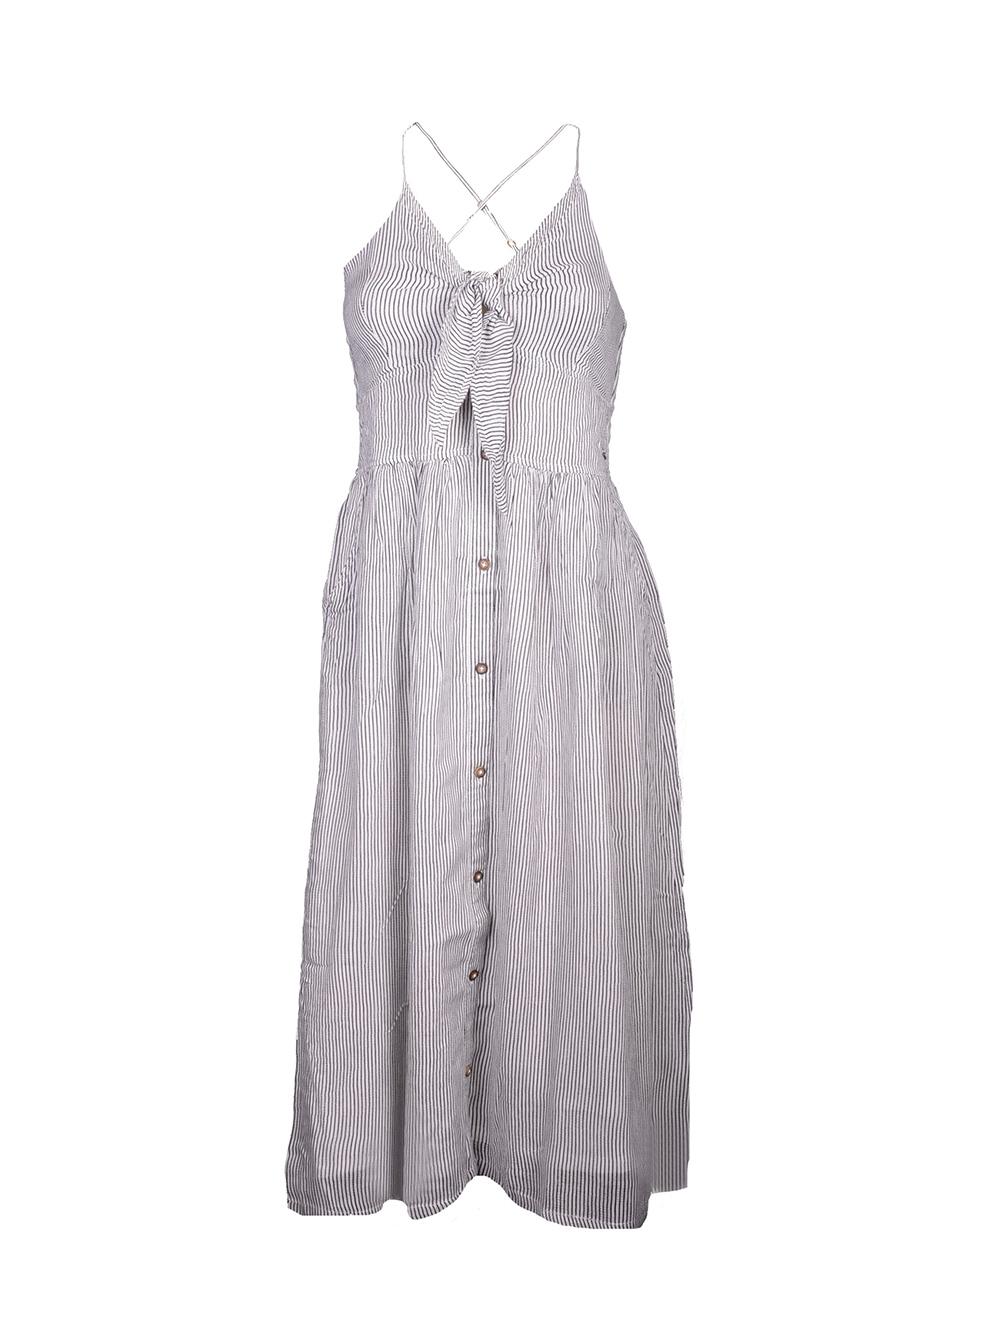 SUPERDRY Φόρεμα midi G801240T ΡΙΓΕ ΜΑΡΙΝΕ-ΛΕΥΚΟ